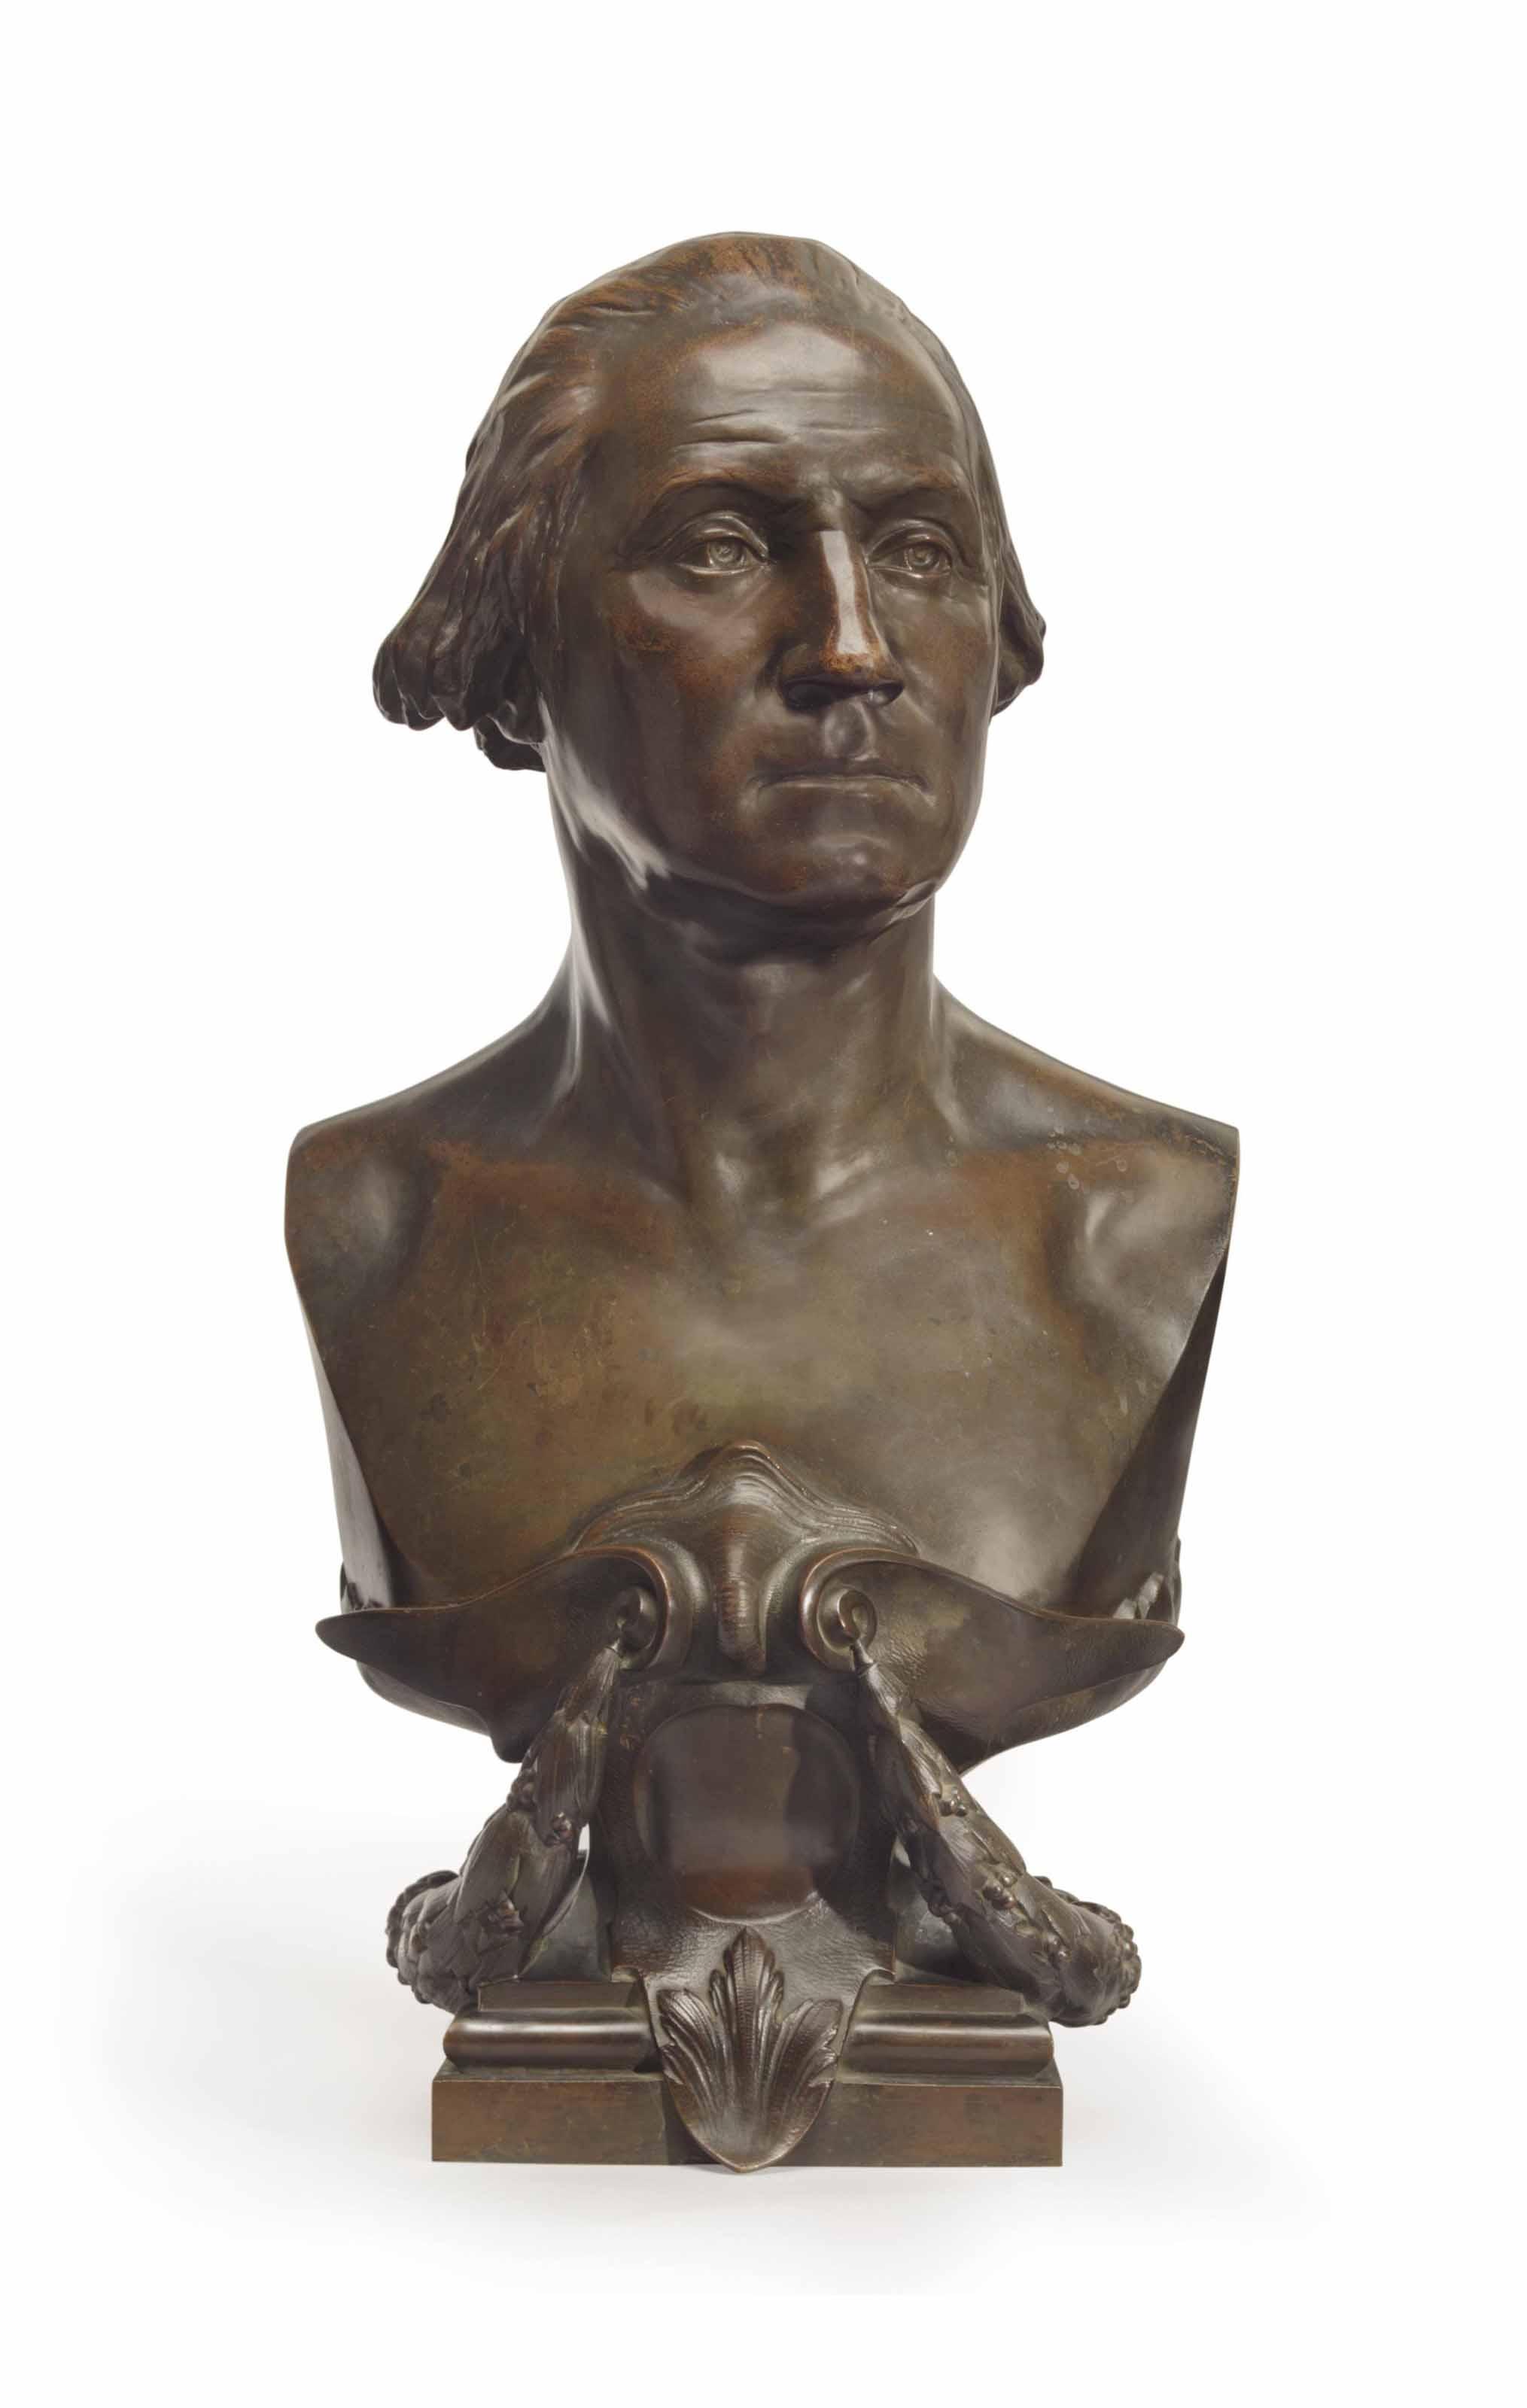 Bust of George Washington, 19th Century